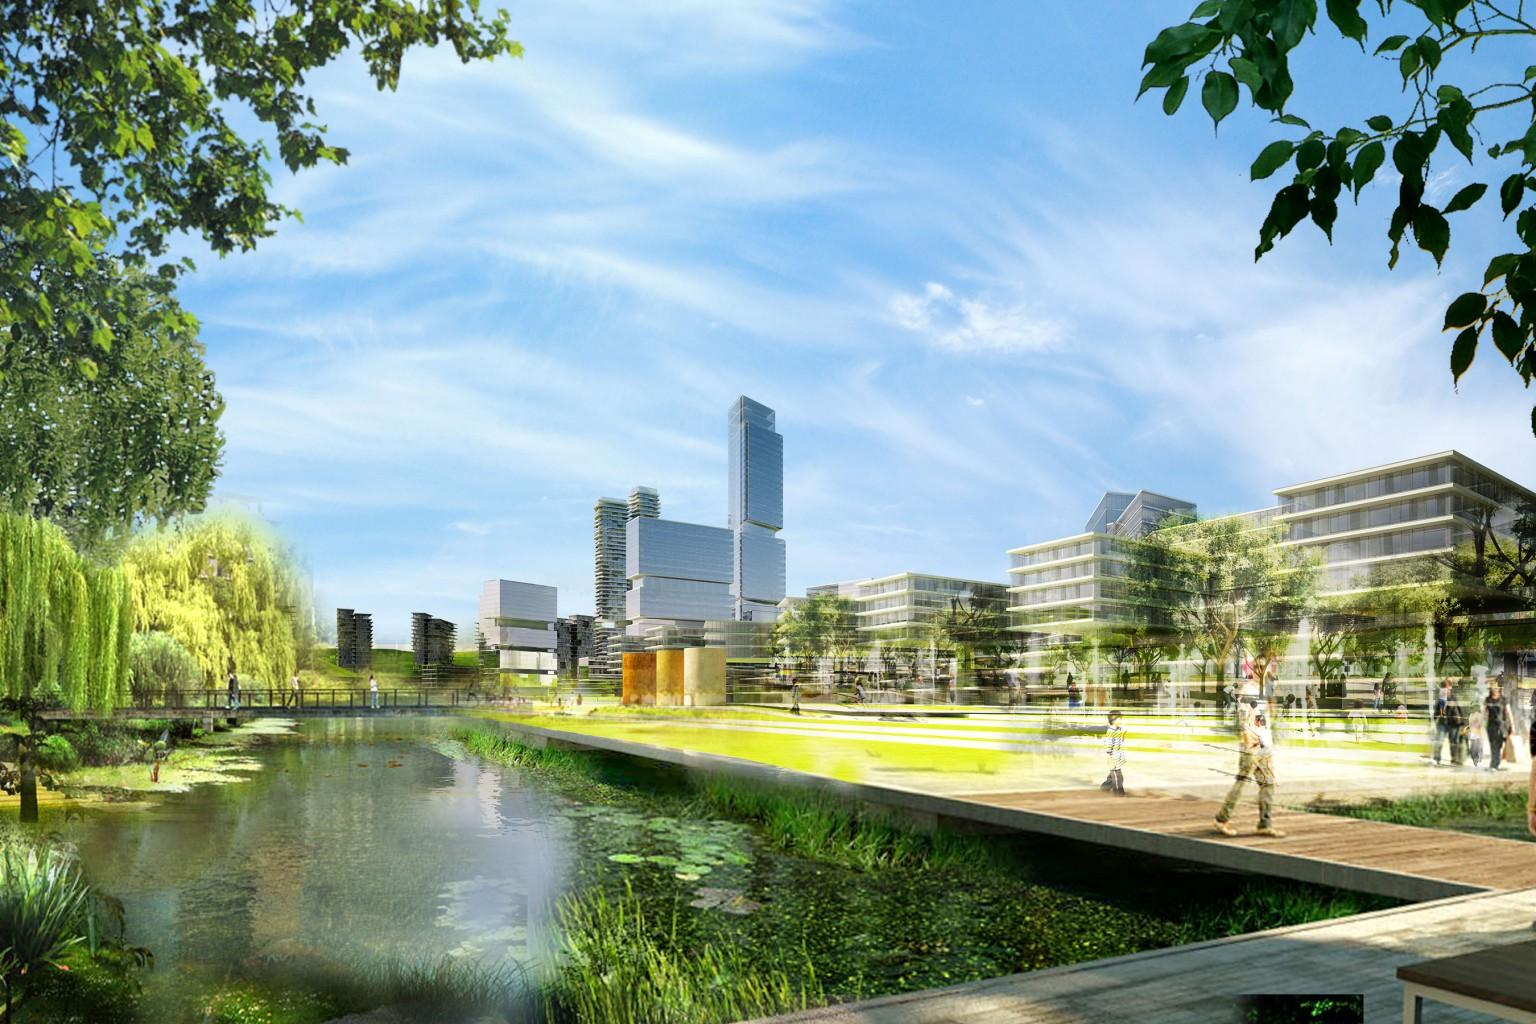 TA_TabanliogluArchitects_Cendere_Valley_Urban_Development_4